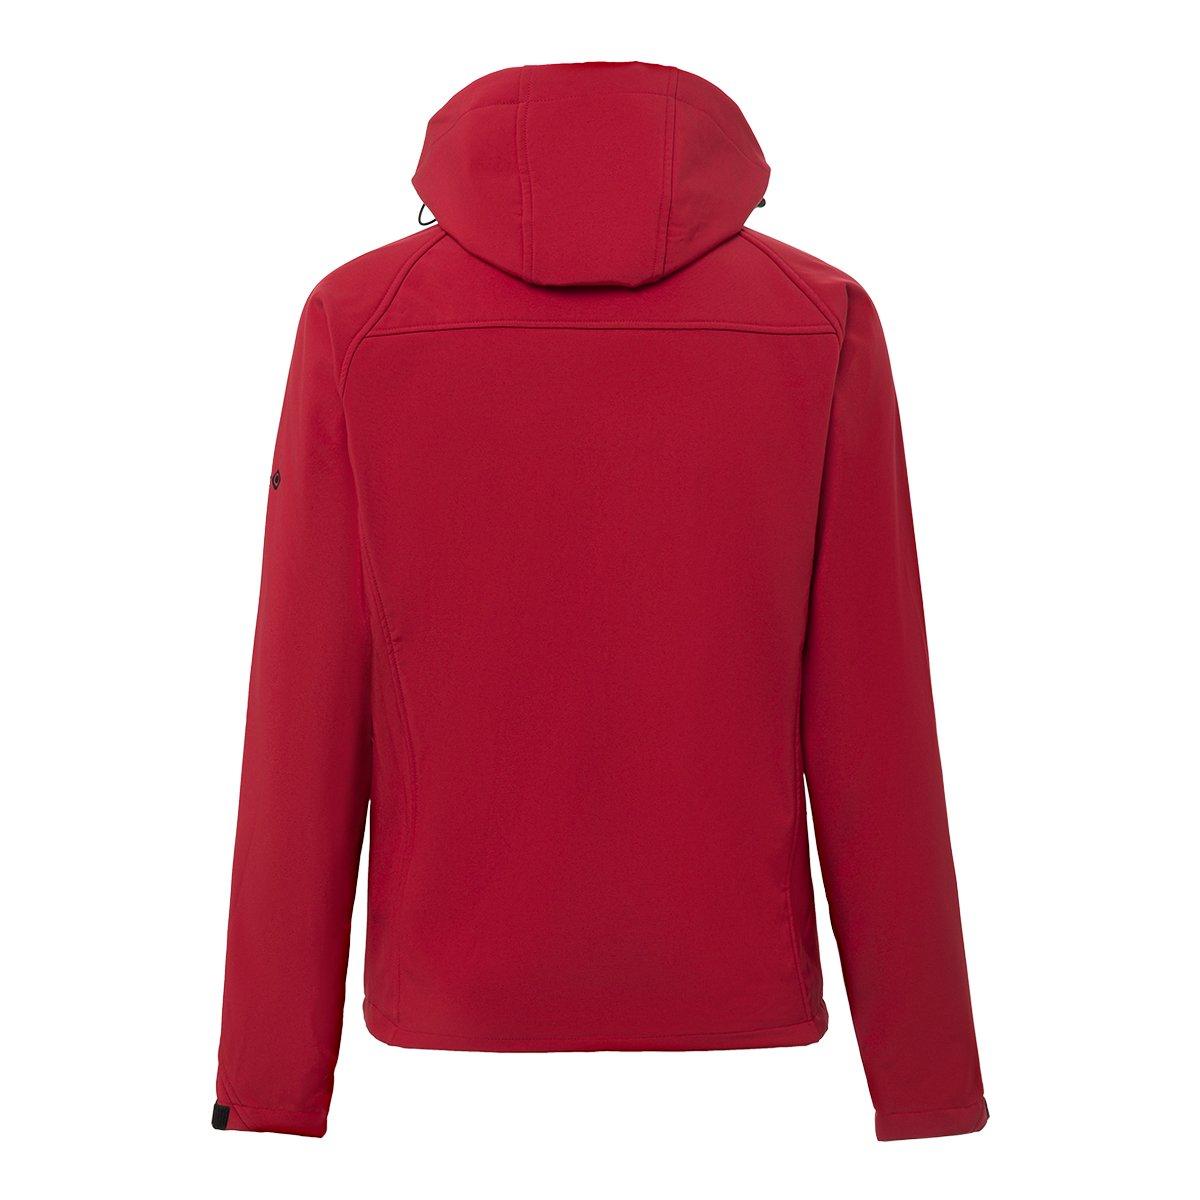 Izas Stratus men/'s softshell jacket.